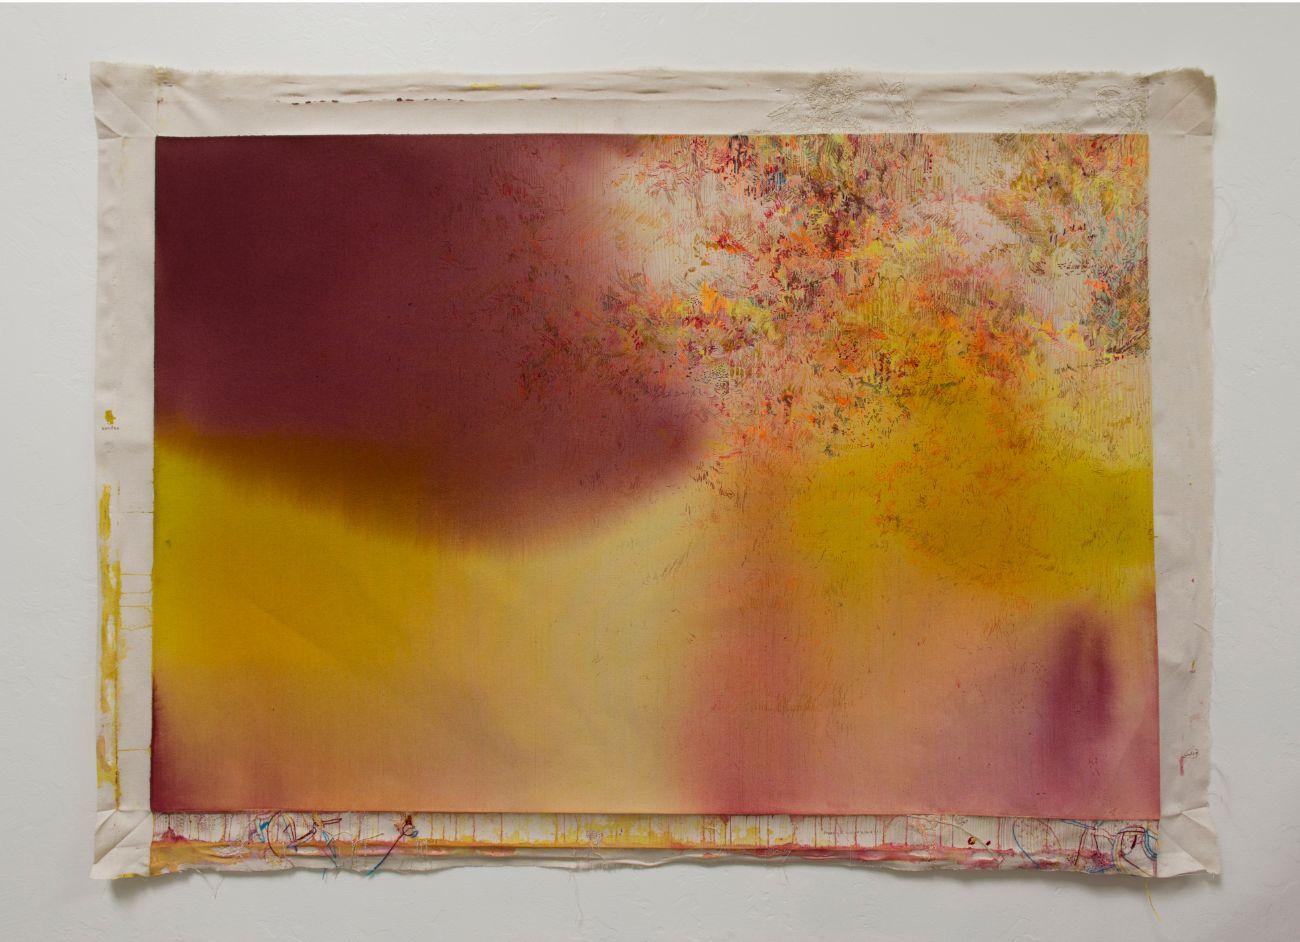 Rain, 150x107cm, mixed media on canvas